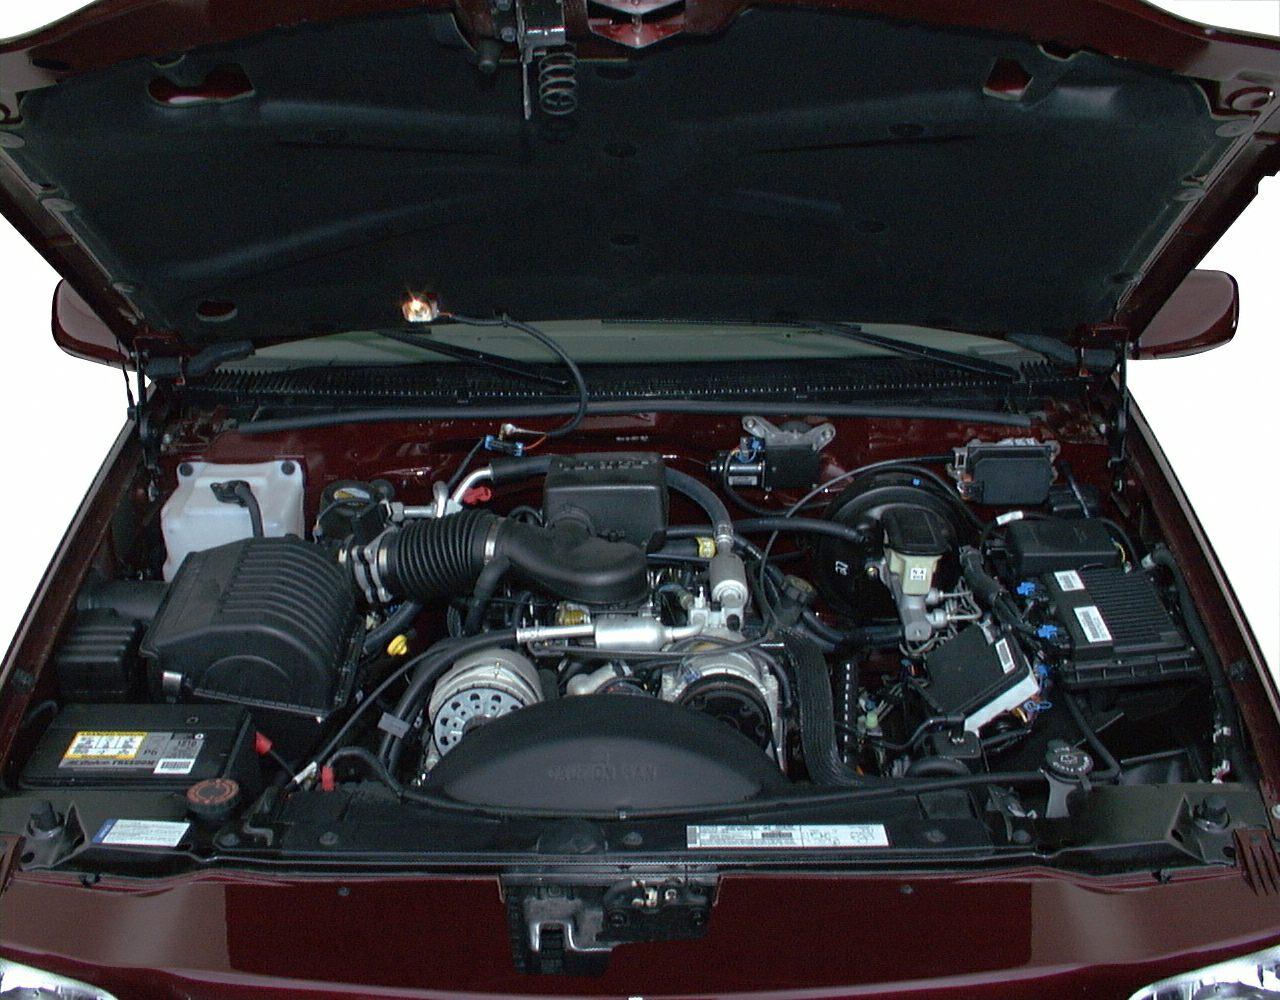 2000 Cadillac Escalade Specs and Prices